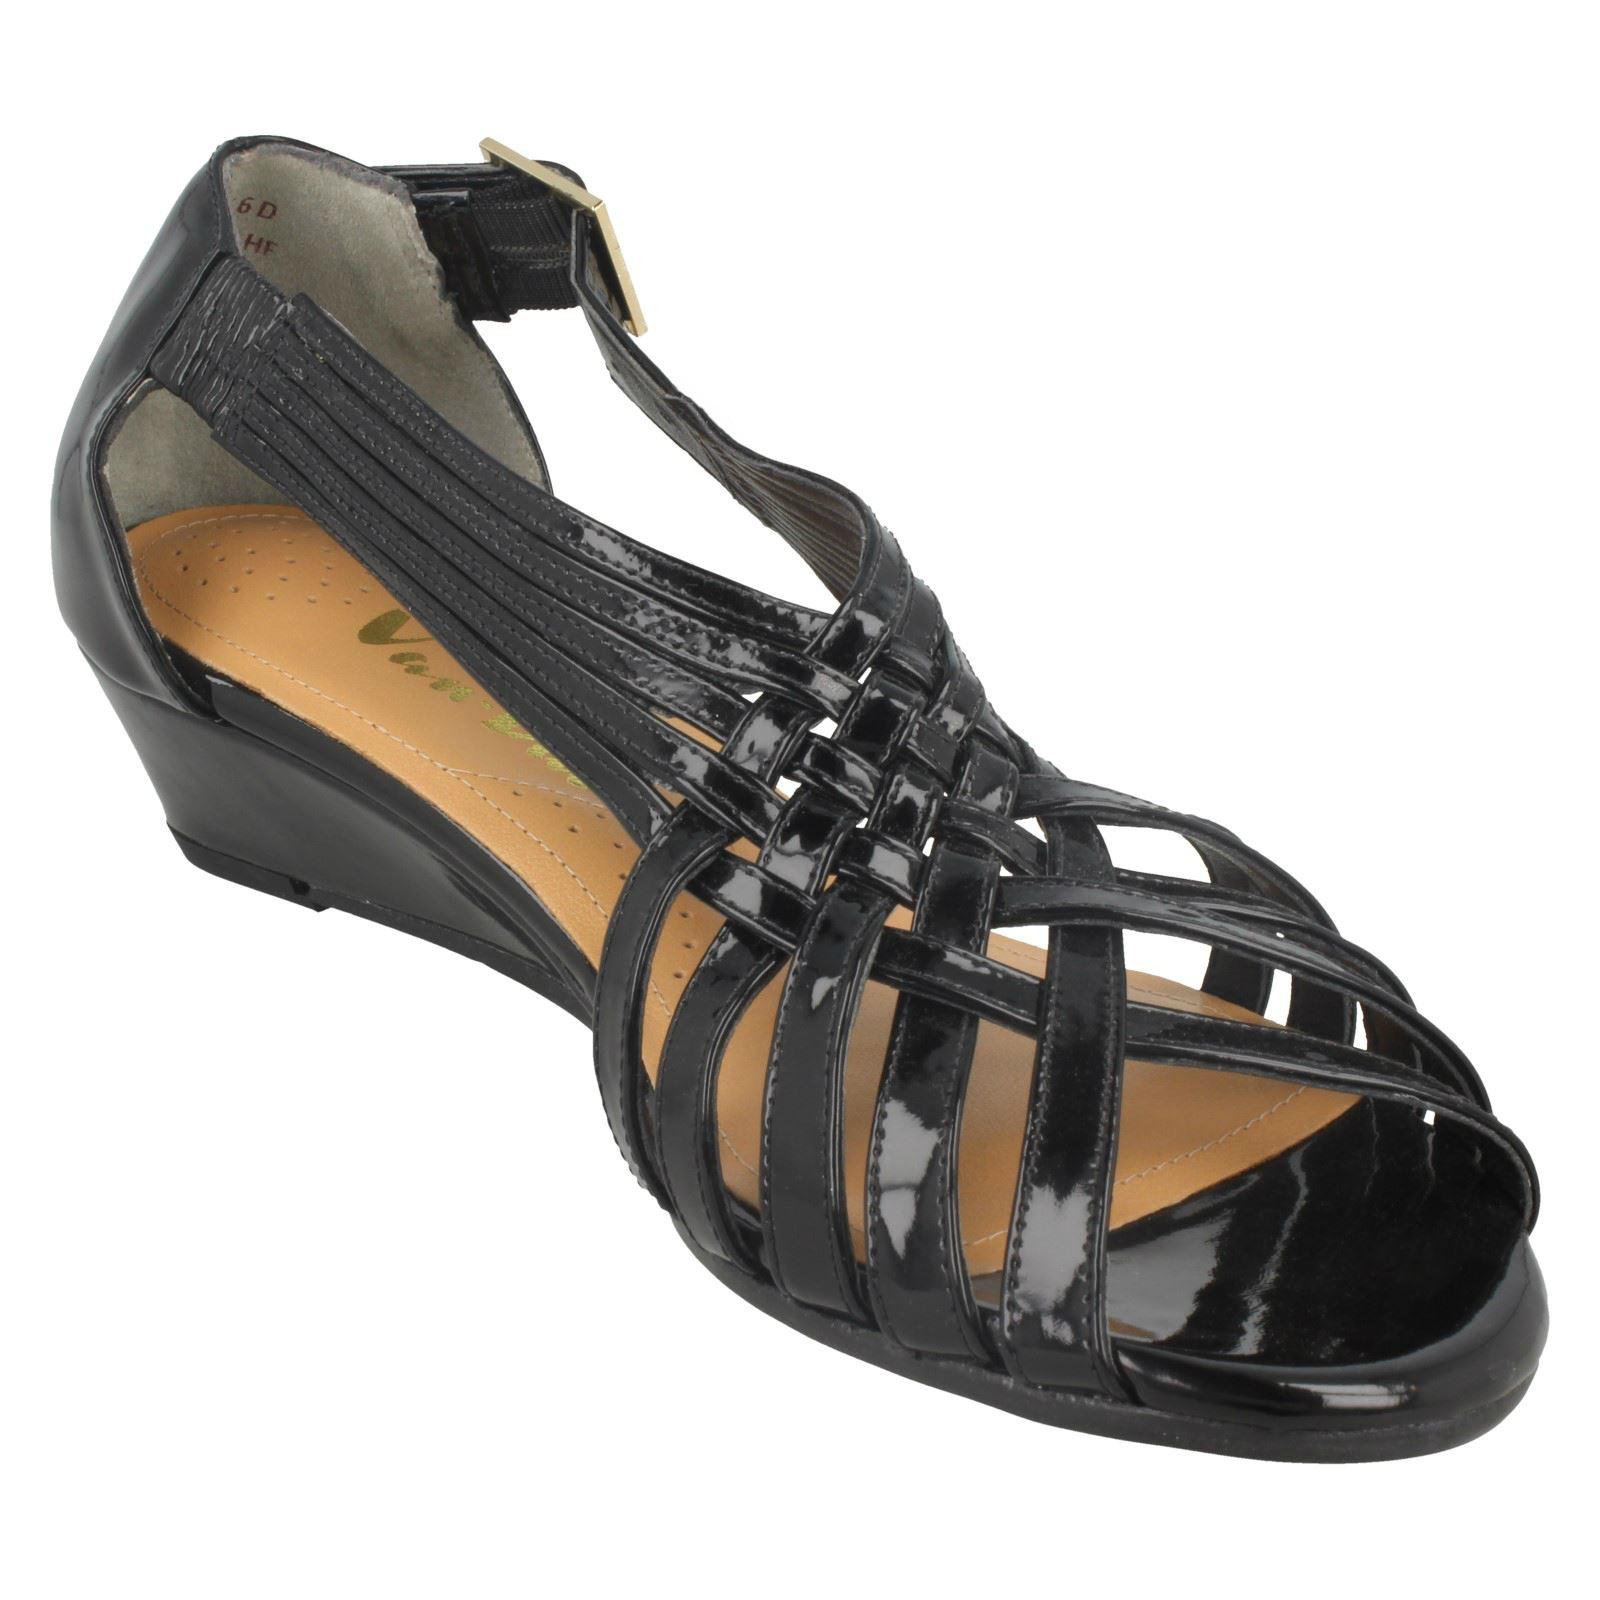 Ladies-Van-Dal-Wedge-Strappy-Sandals-Lucie thumbnail 10